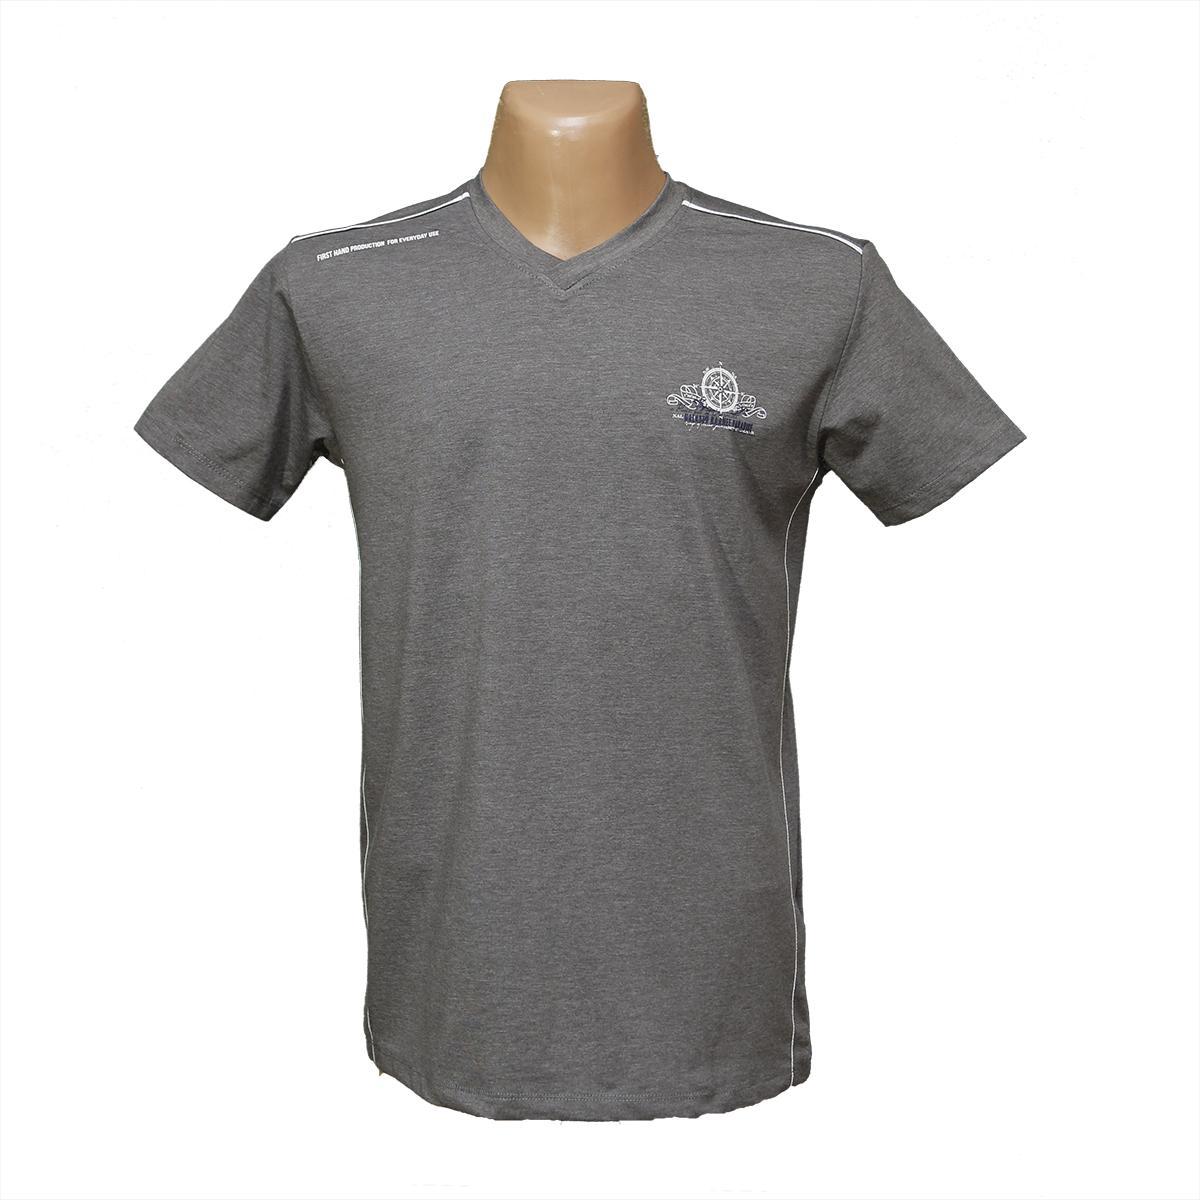 Мужская стрейчевая футболка Lycra тм. BY Walker. пр-во Турция 4016-6